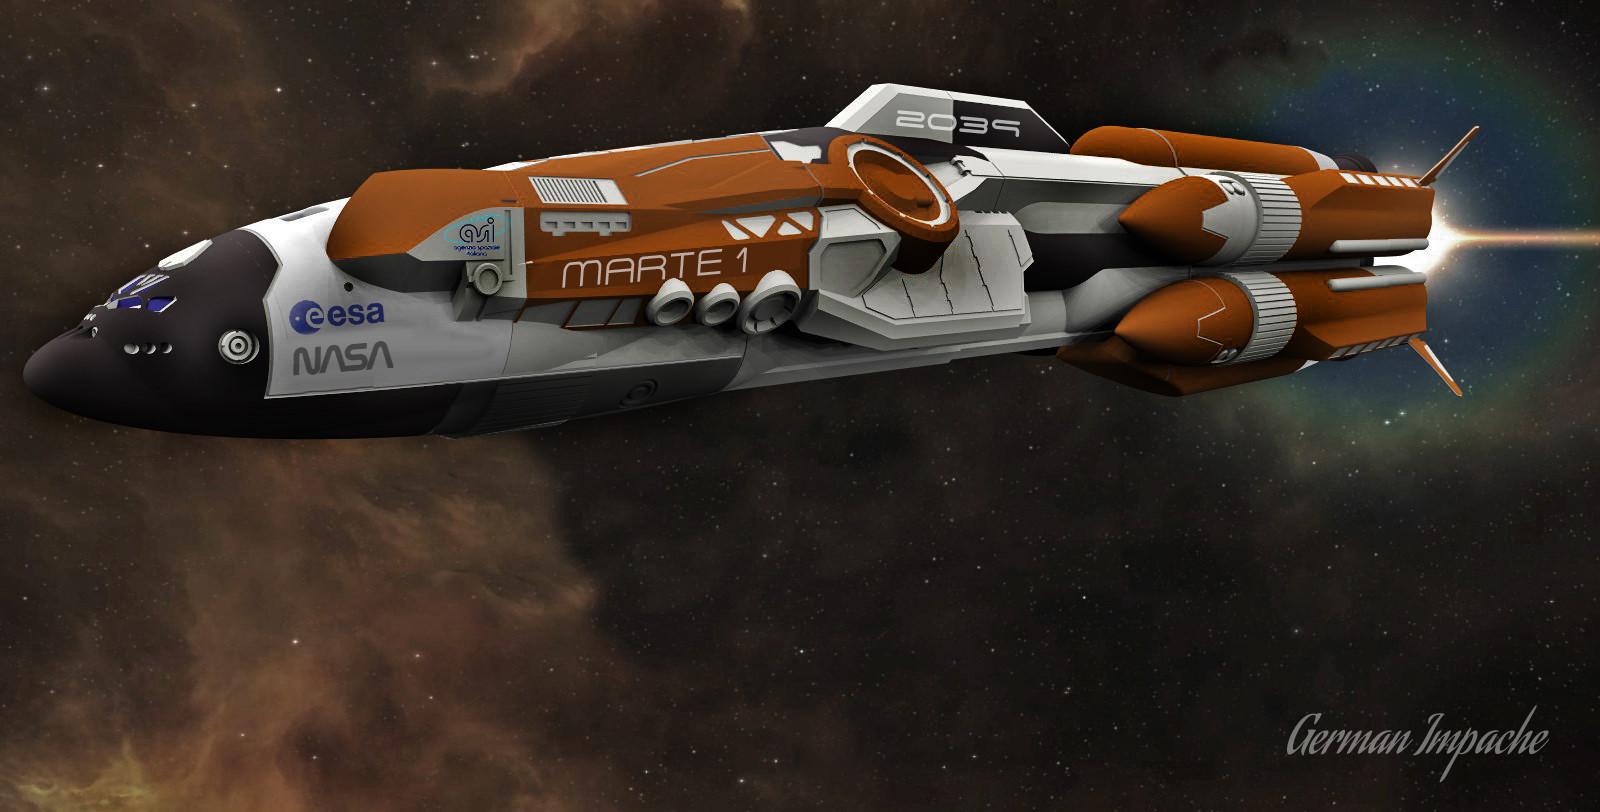 Starship MARTE 1